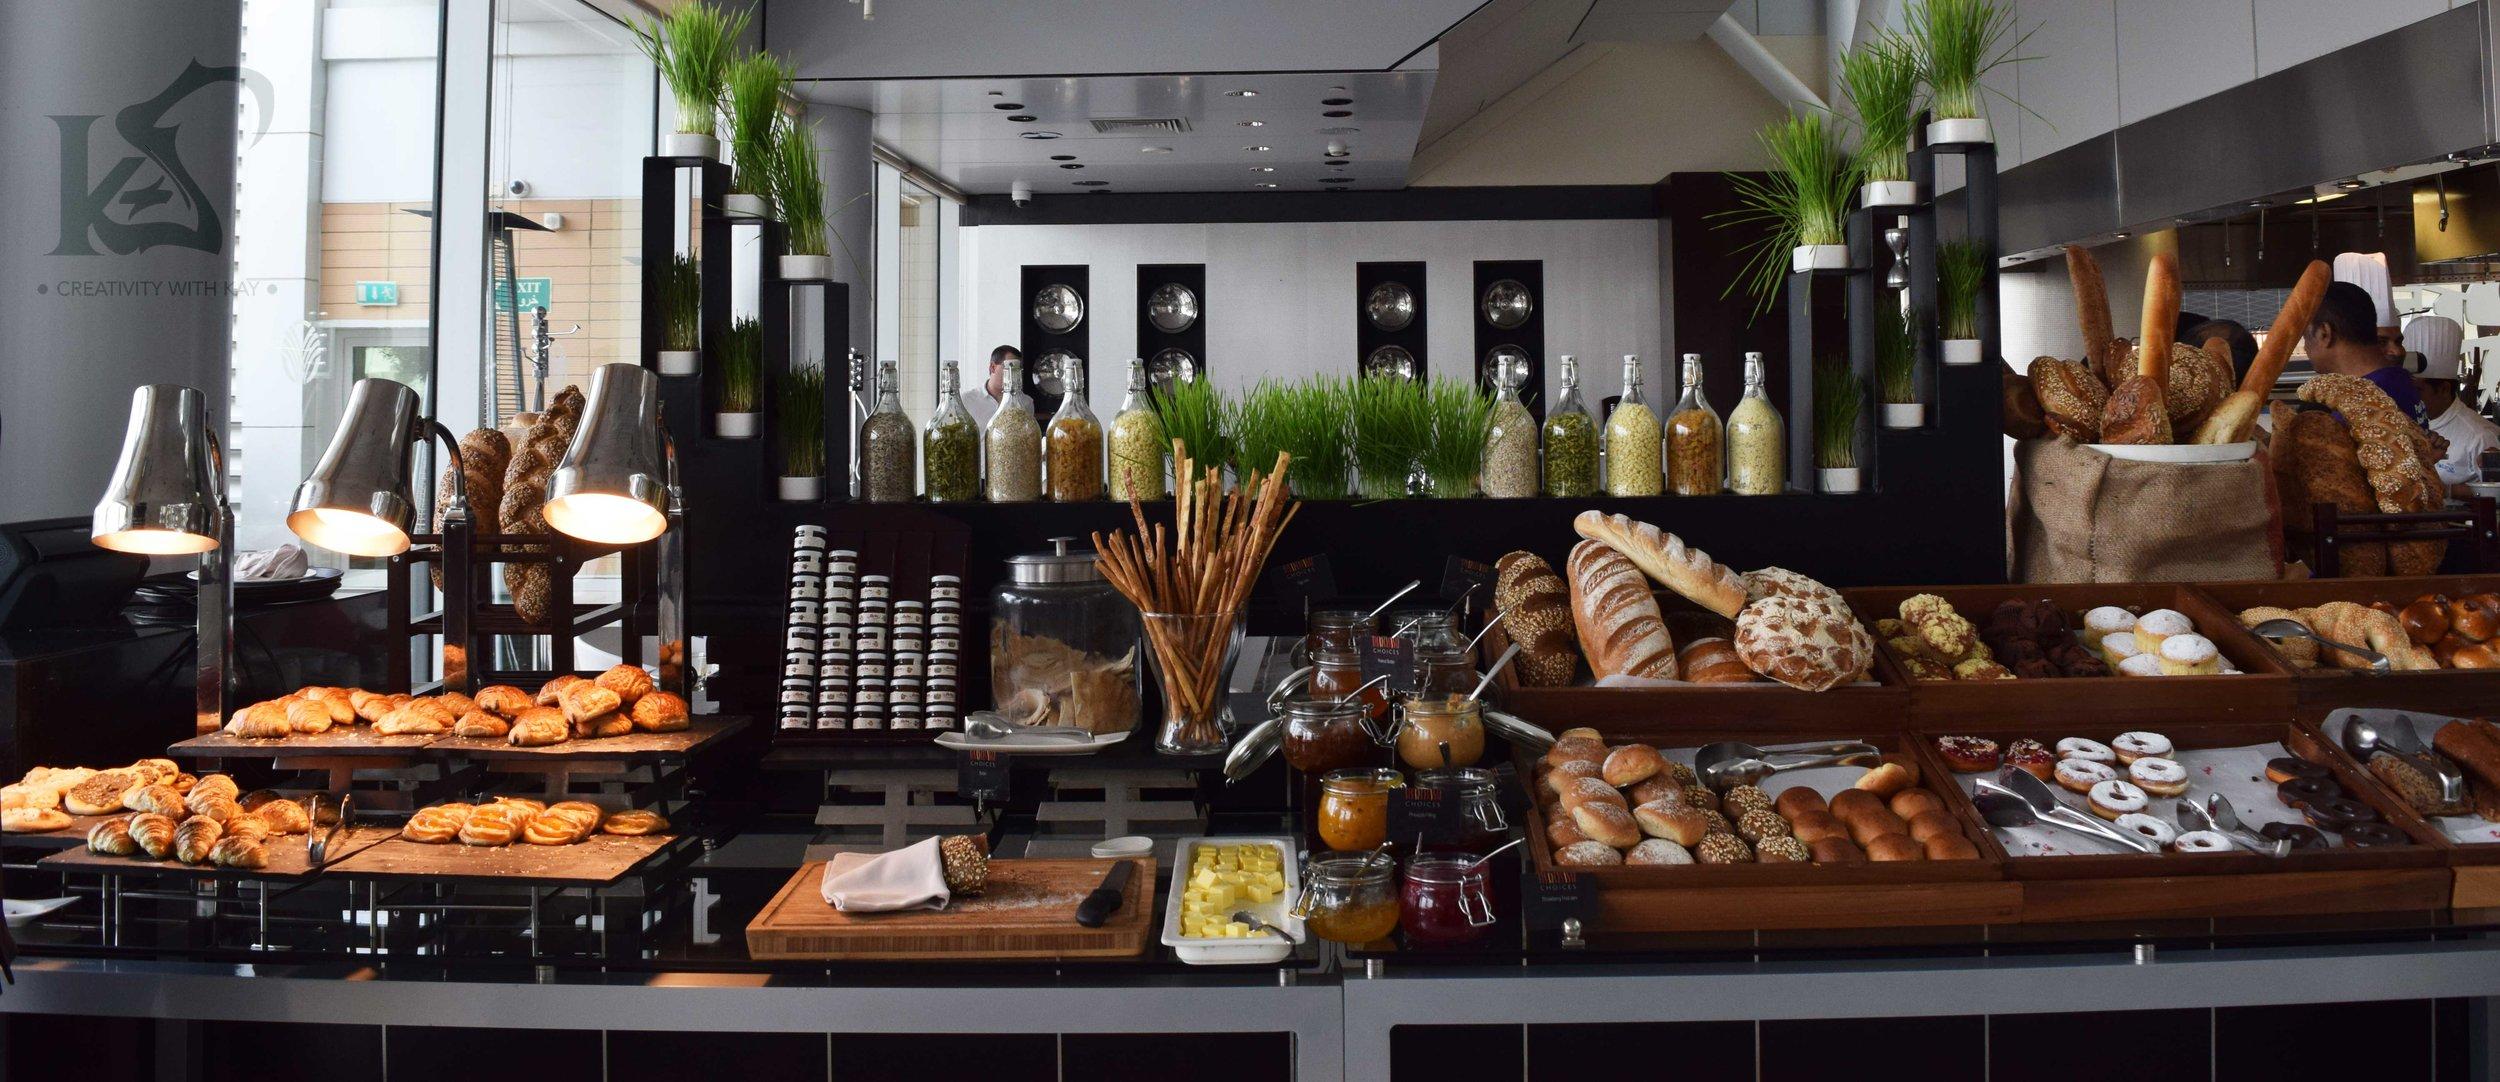 food-bakery-bread-bun